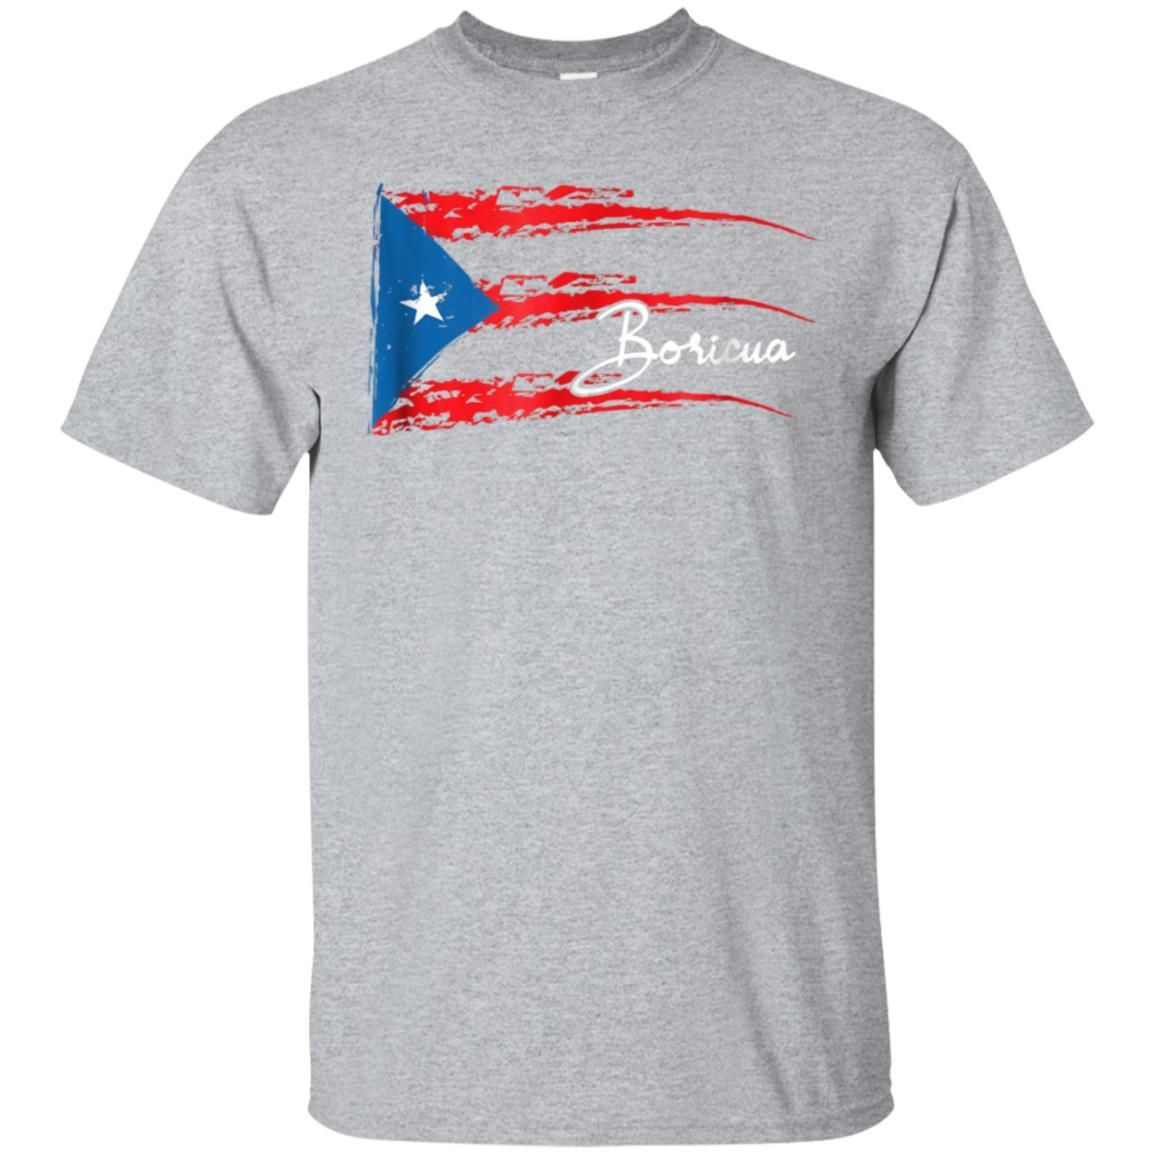 Awesome Puerto Rico Flag Shirt Boricua T Shirt Shirts T Shirt Flag Shirt